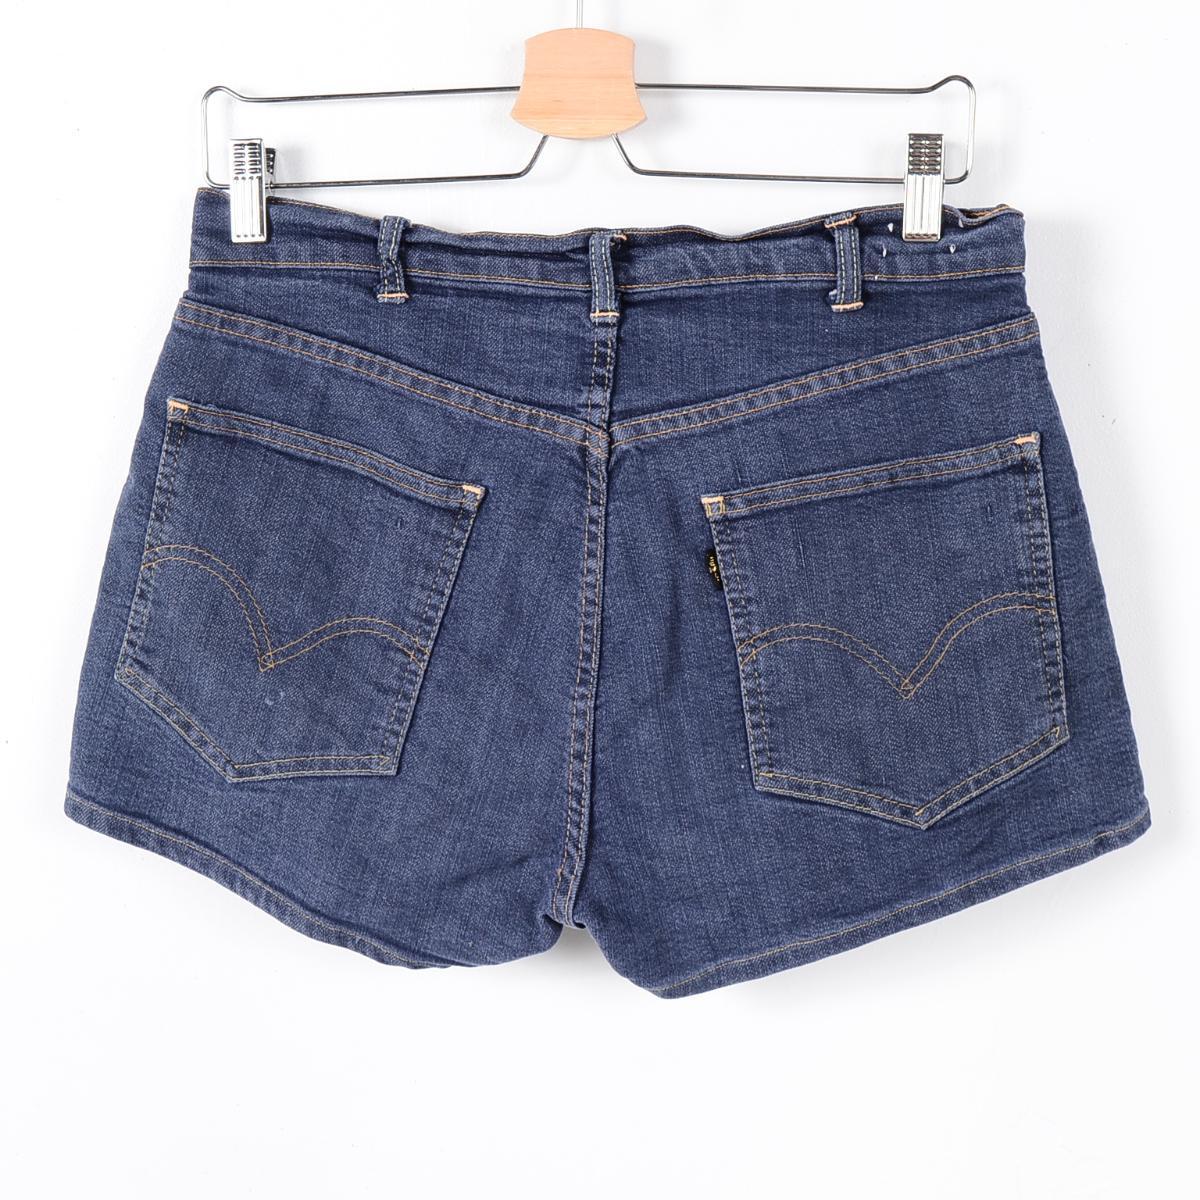 VINTAGE CLOTHING JAM TRADING | Rakuten Global Market: 70s Levis ...